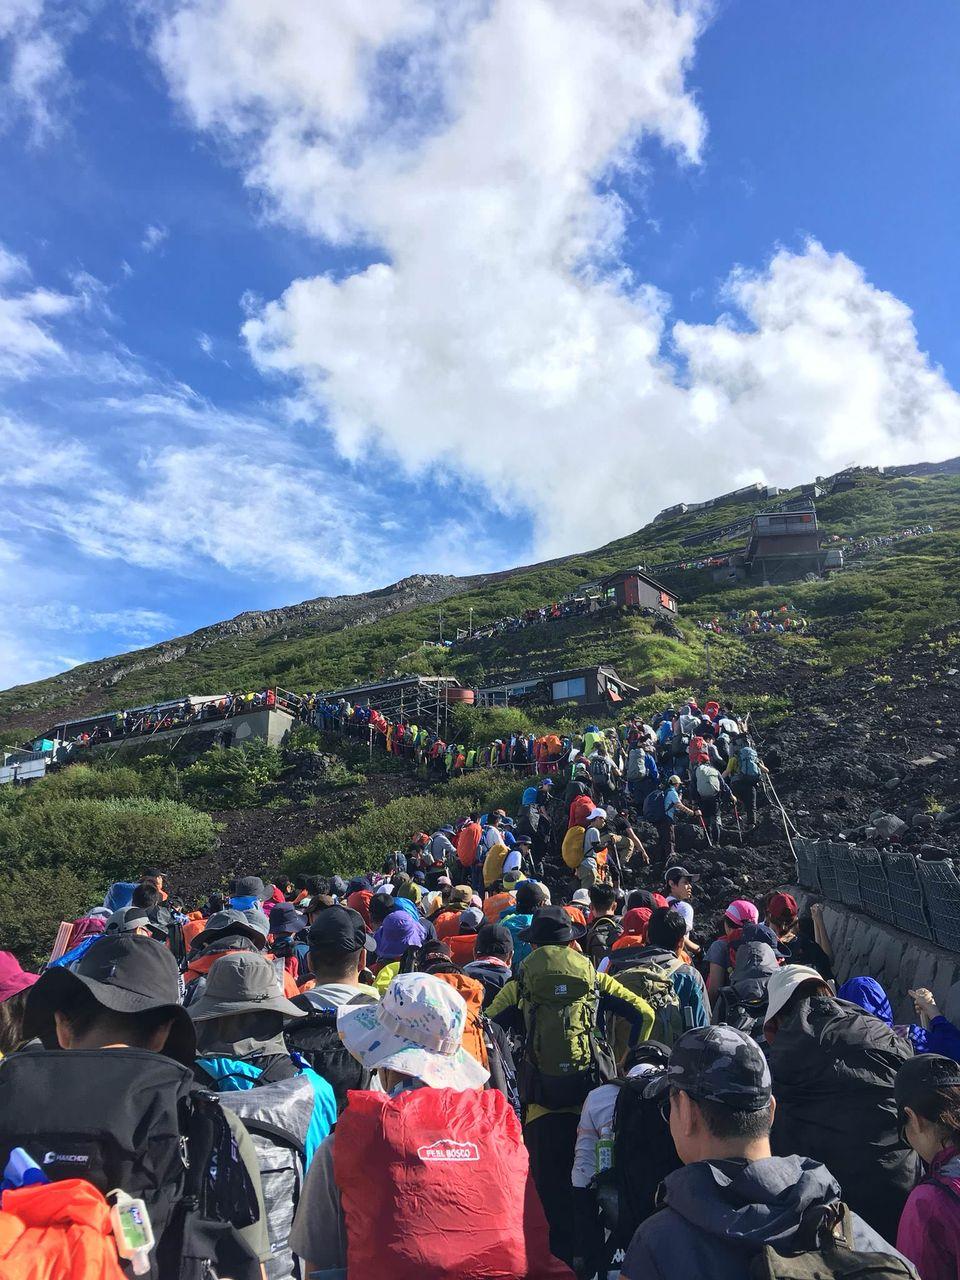 【悲報】富士山が大渋滞